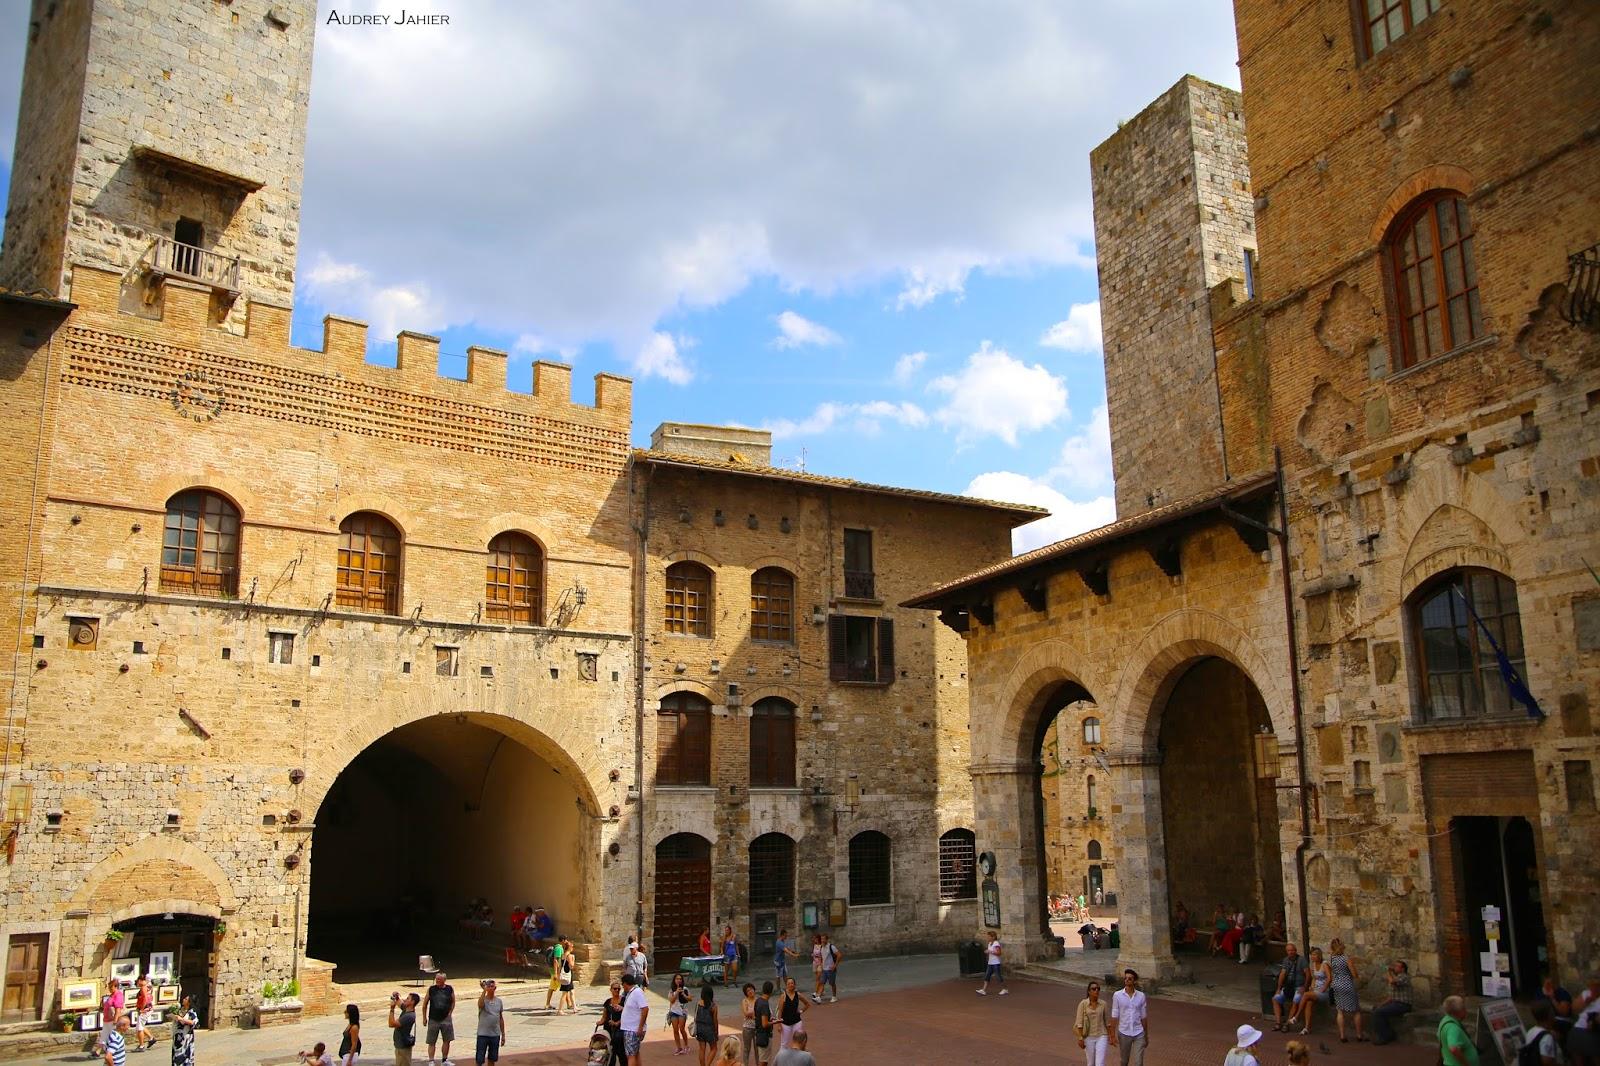 San-gimignano-toscane-tuscany-italie-italia